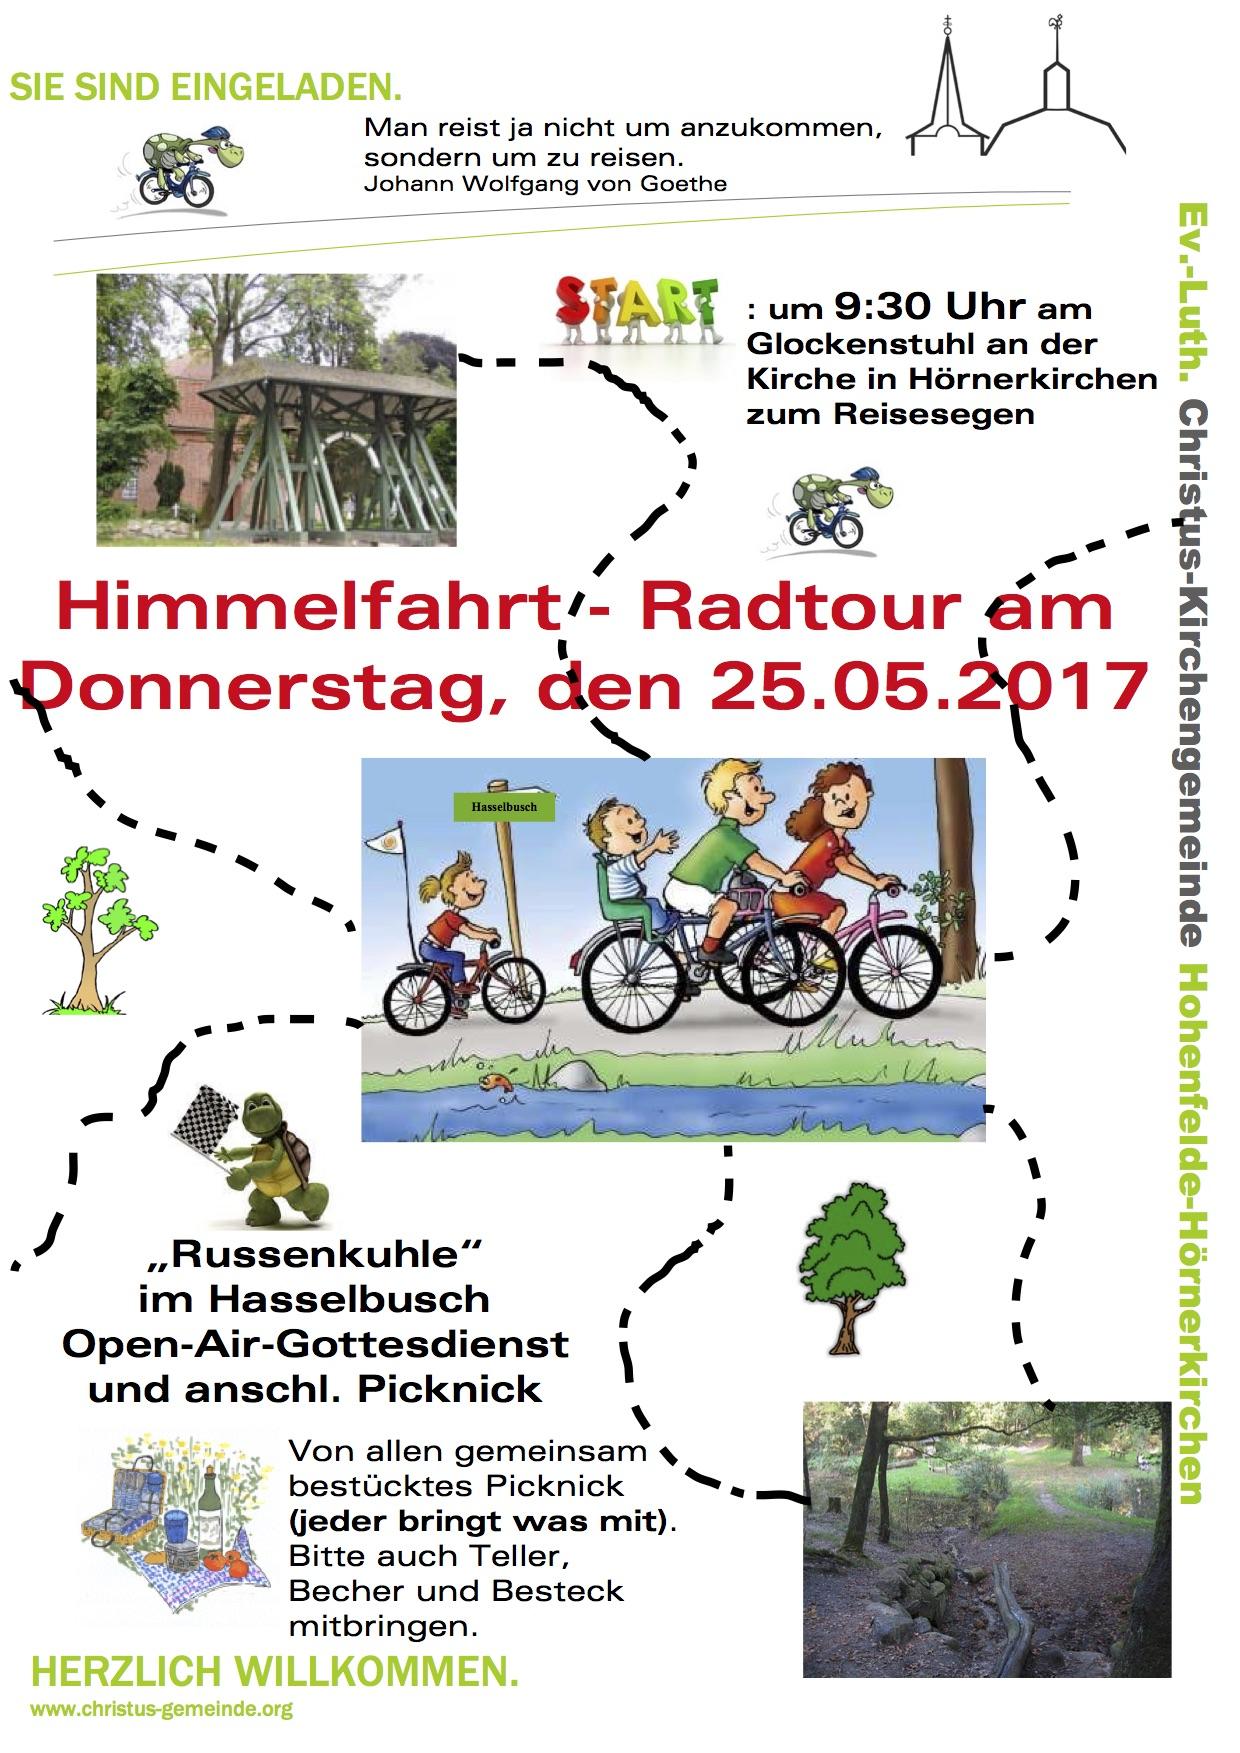 Himmelfahrt-Radtour am 25.5.2017